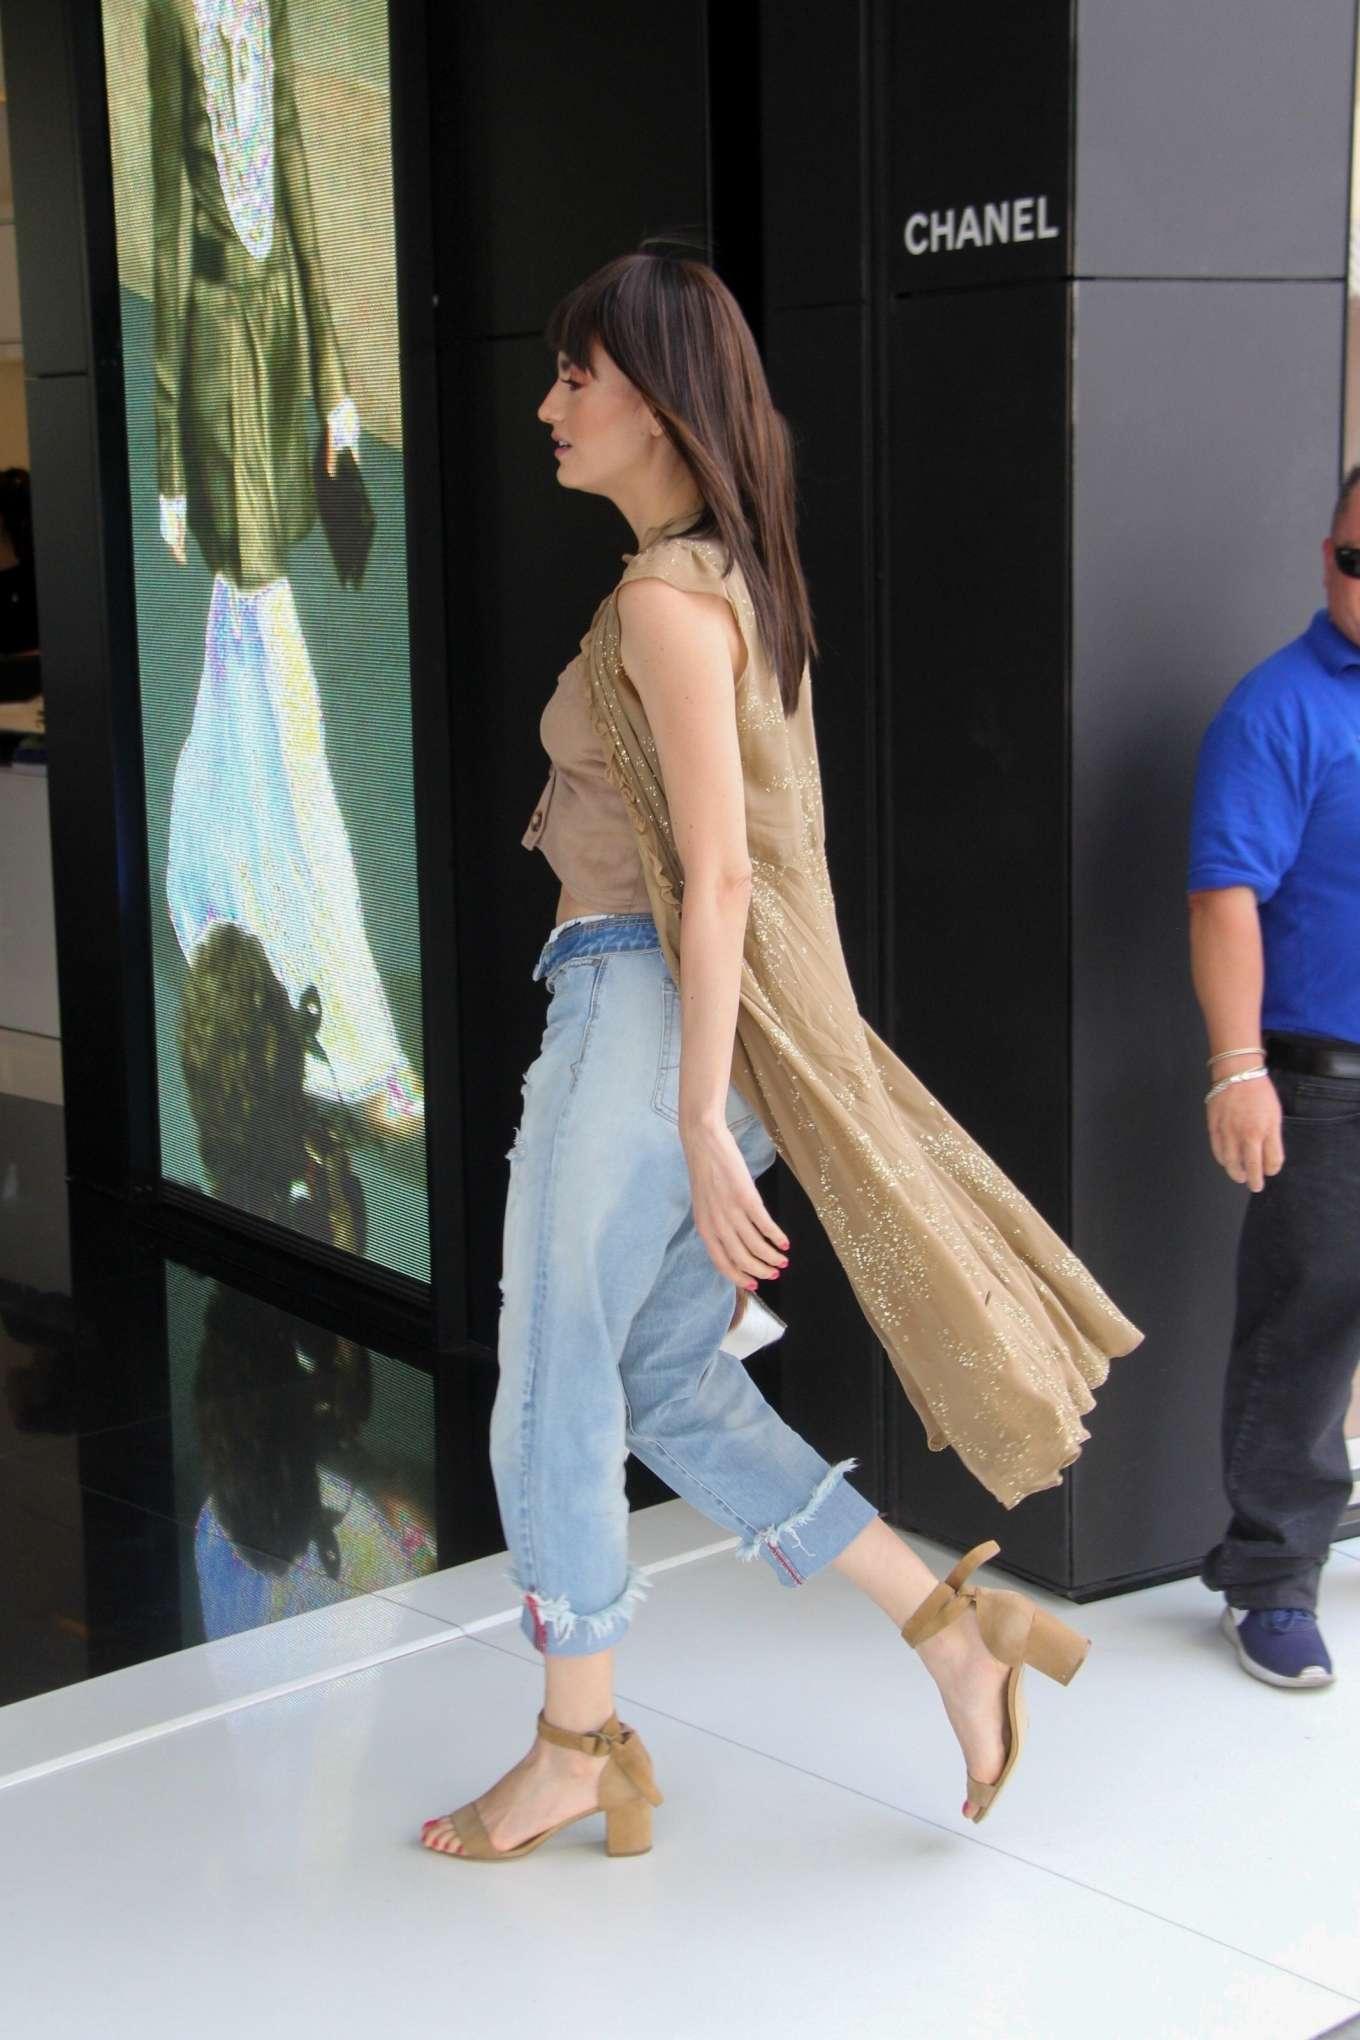 Blanca Blanco 2019 : Blanca Blanco: Shopping at Chanel on Robertson Blvd-12